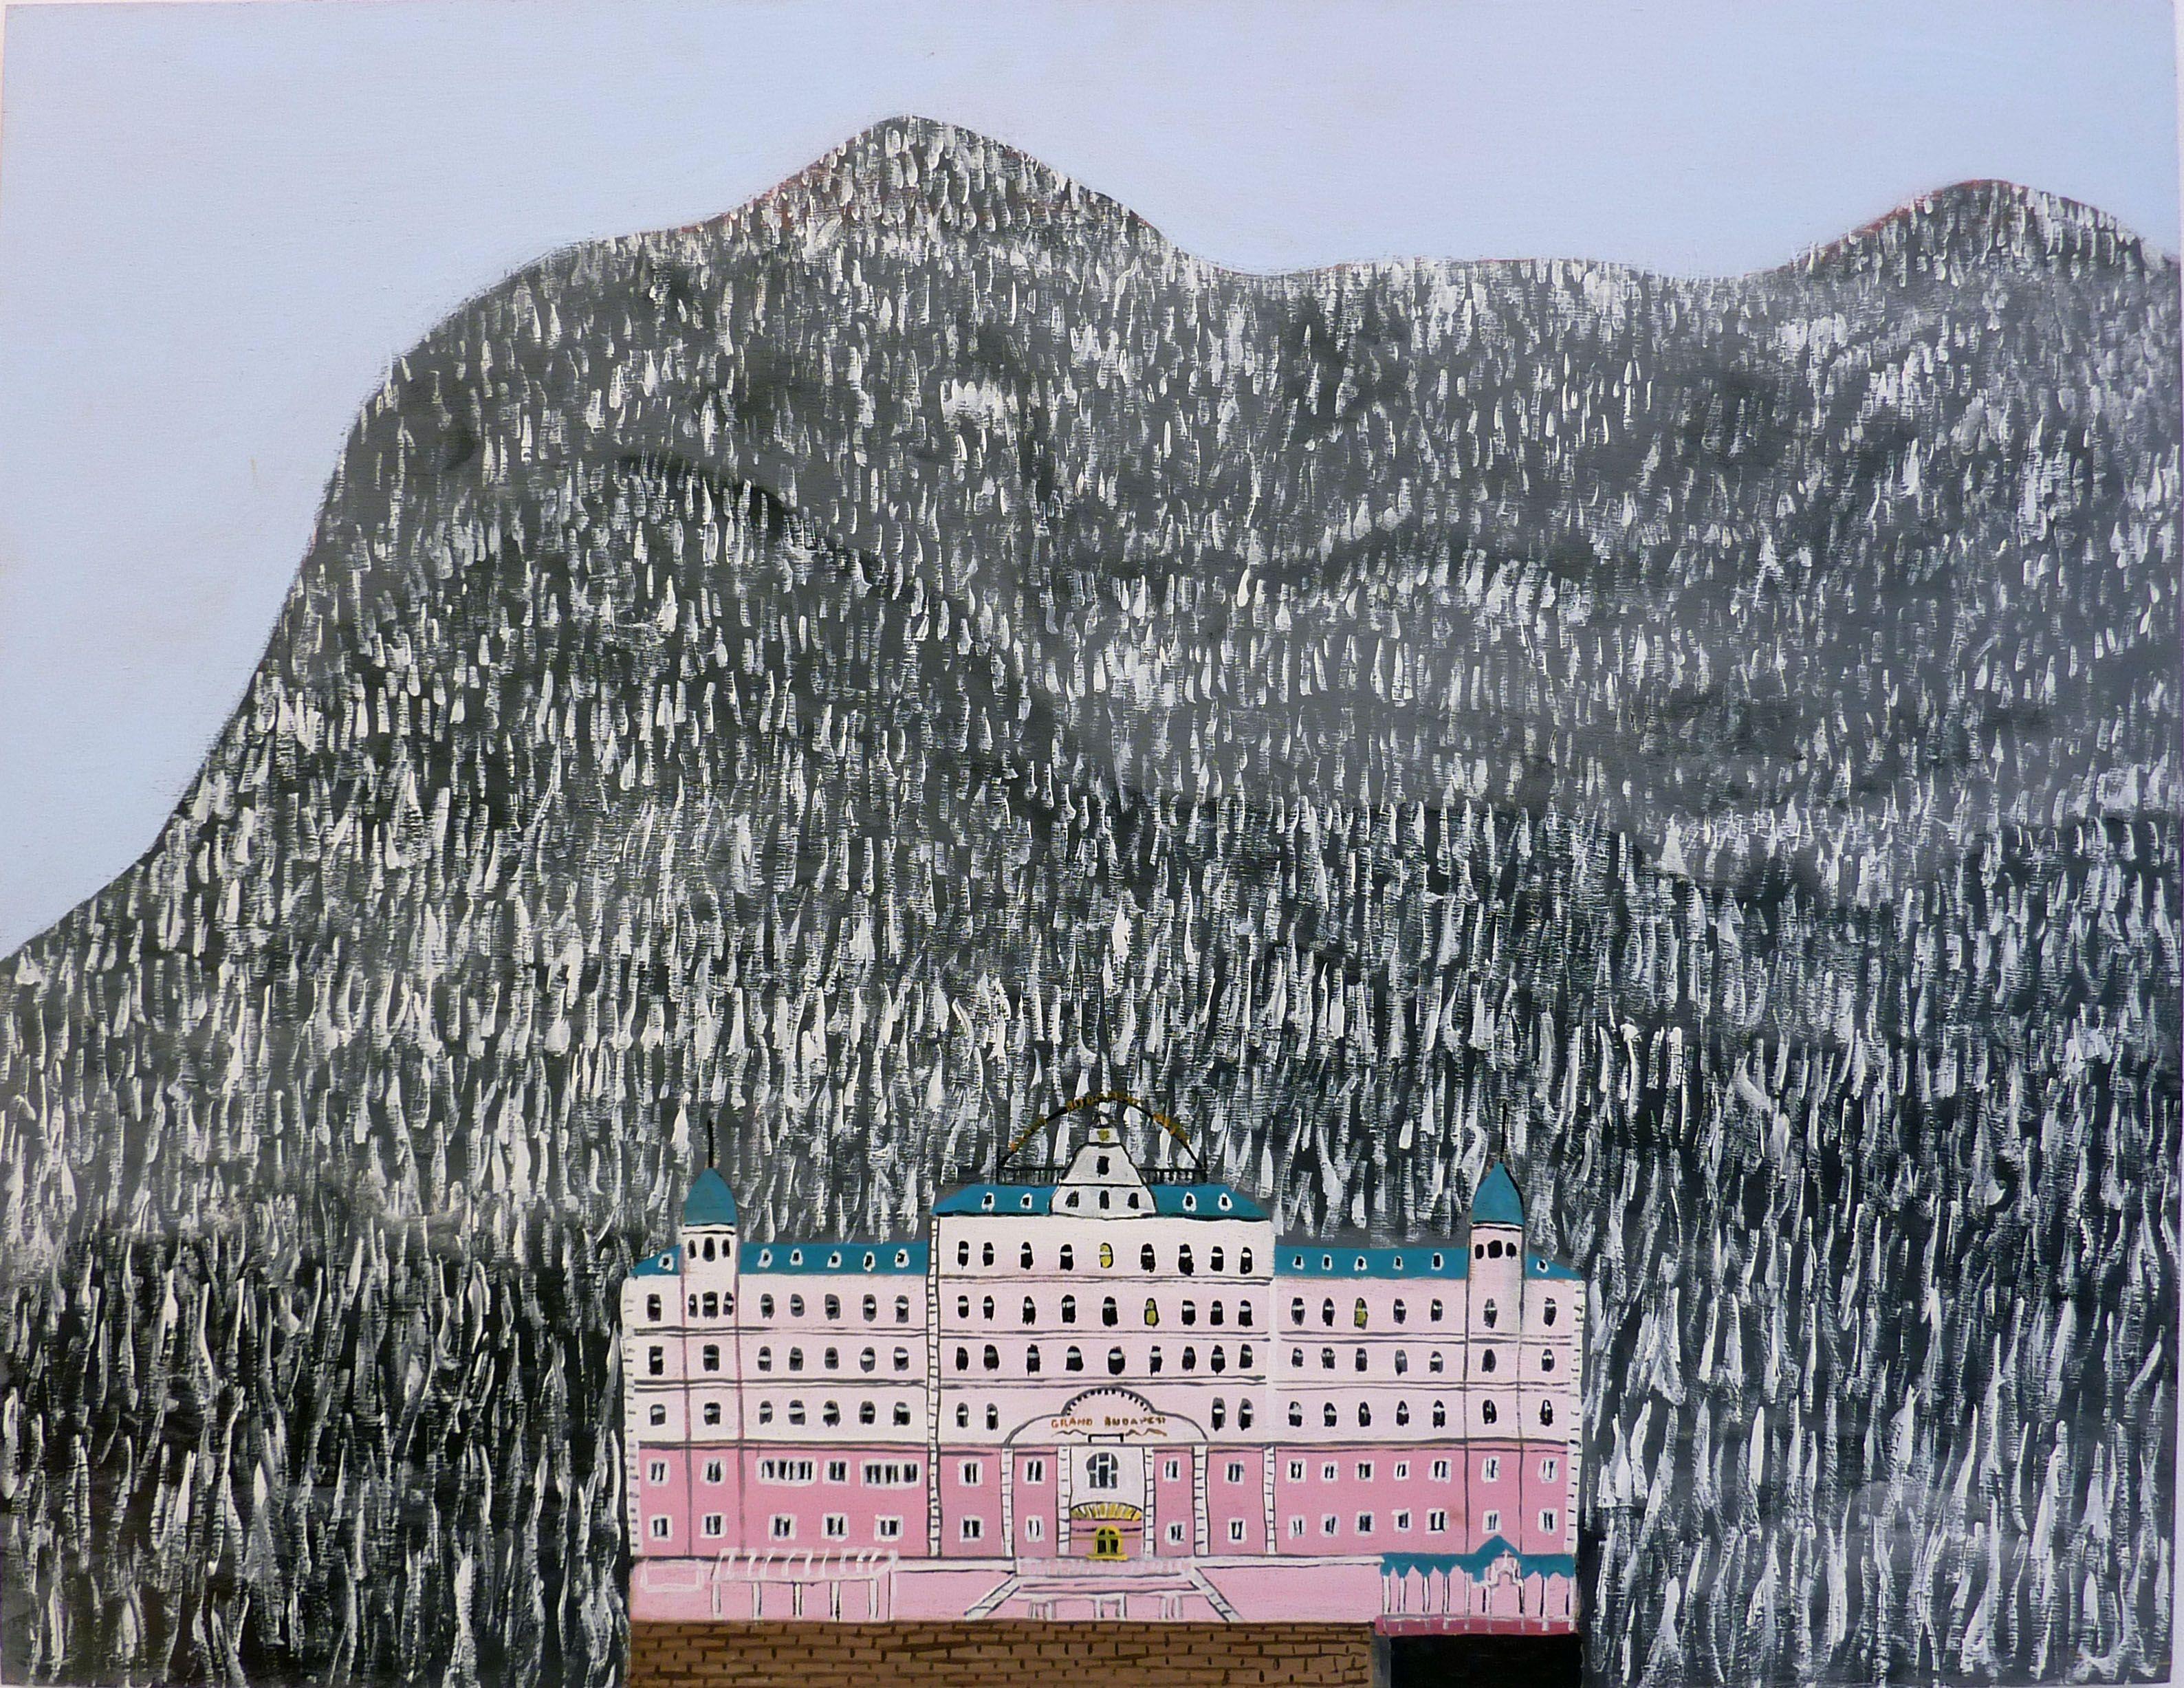 Marc Etherington Grand Budapest Hotel 2014 acrylic on marine plywood 61 x 80 cm  from the Gallery 9 stockroom